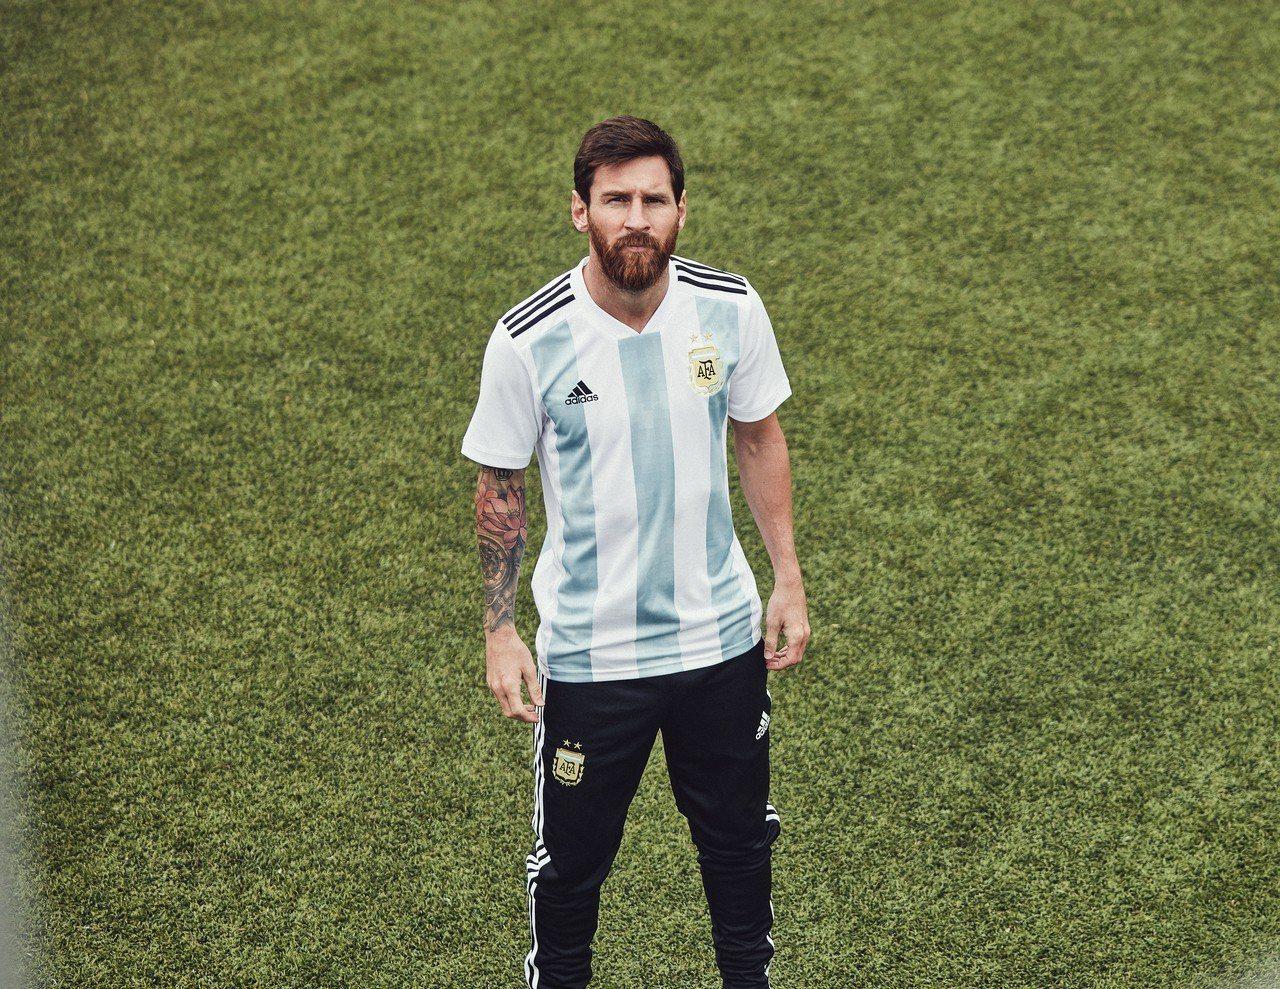 adidas邀請名將梅西詮釋2018年世界盃足球賽阿根廷國家隊主場球衣,球員版4...